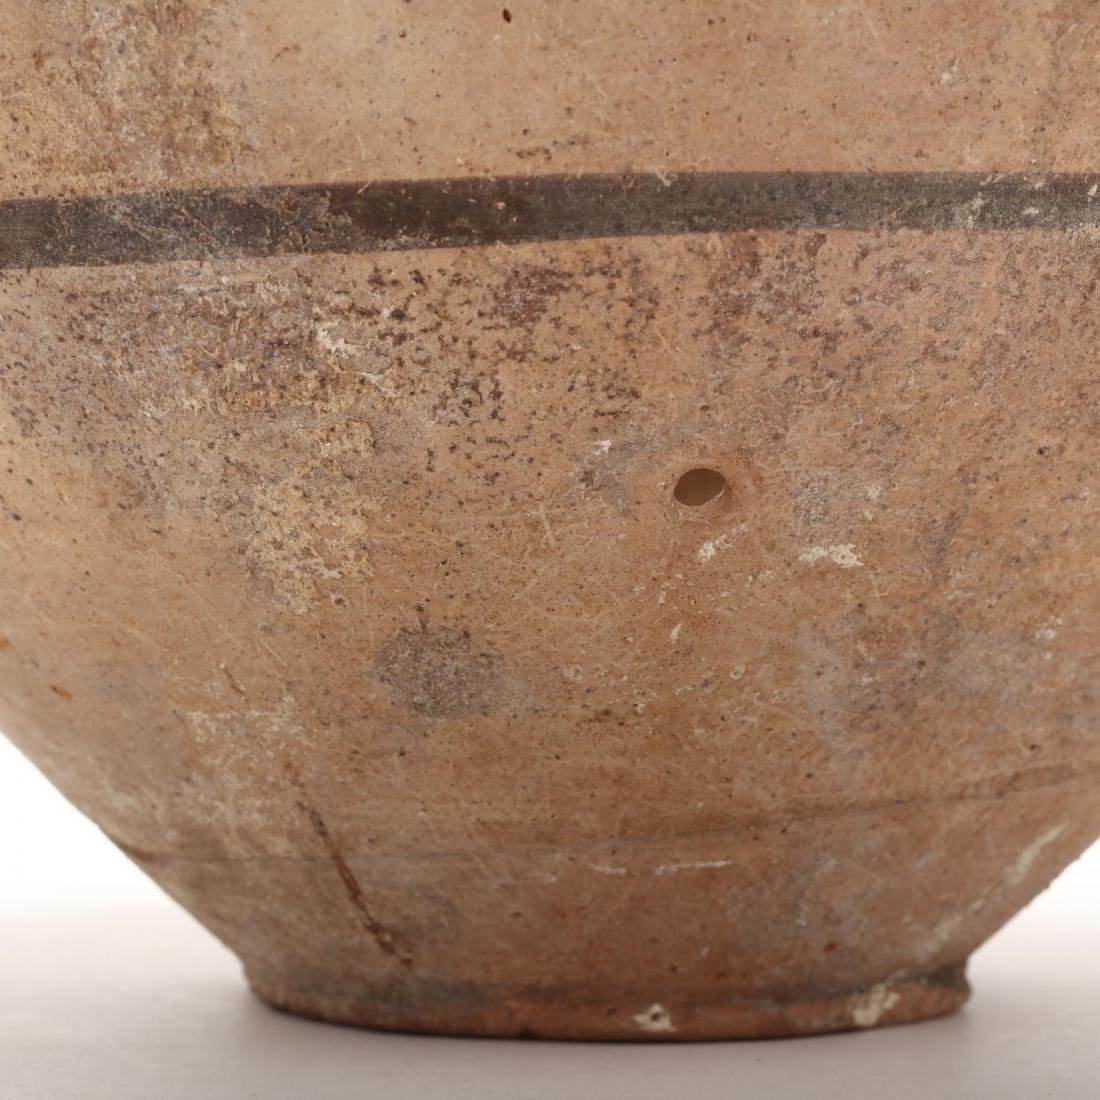 Cypro-Geometric Bichrome Amphora - 2